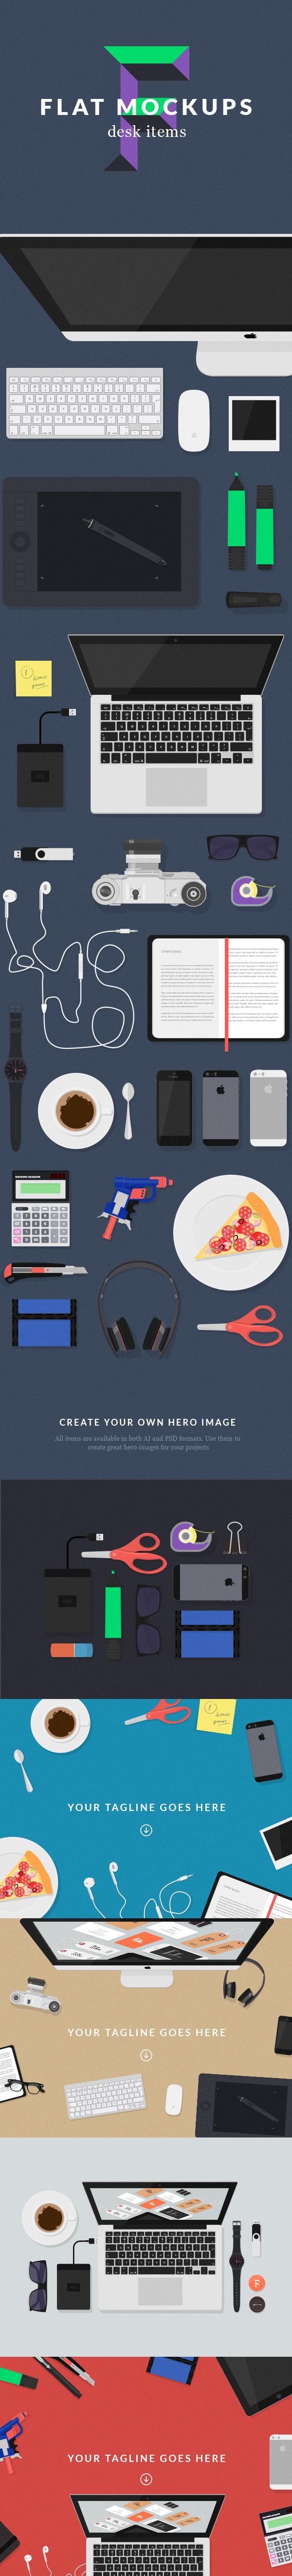 flat mock-up desk workspace hero image free psd Illustrator vector freebie